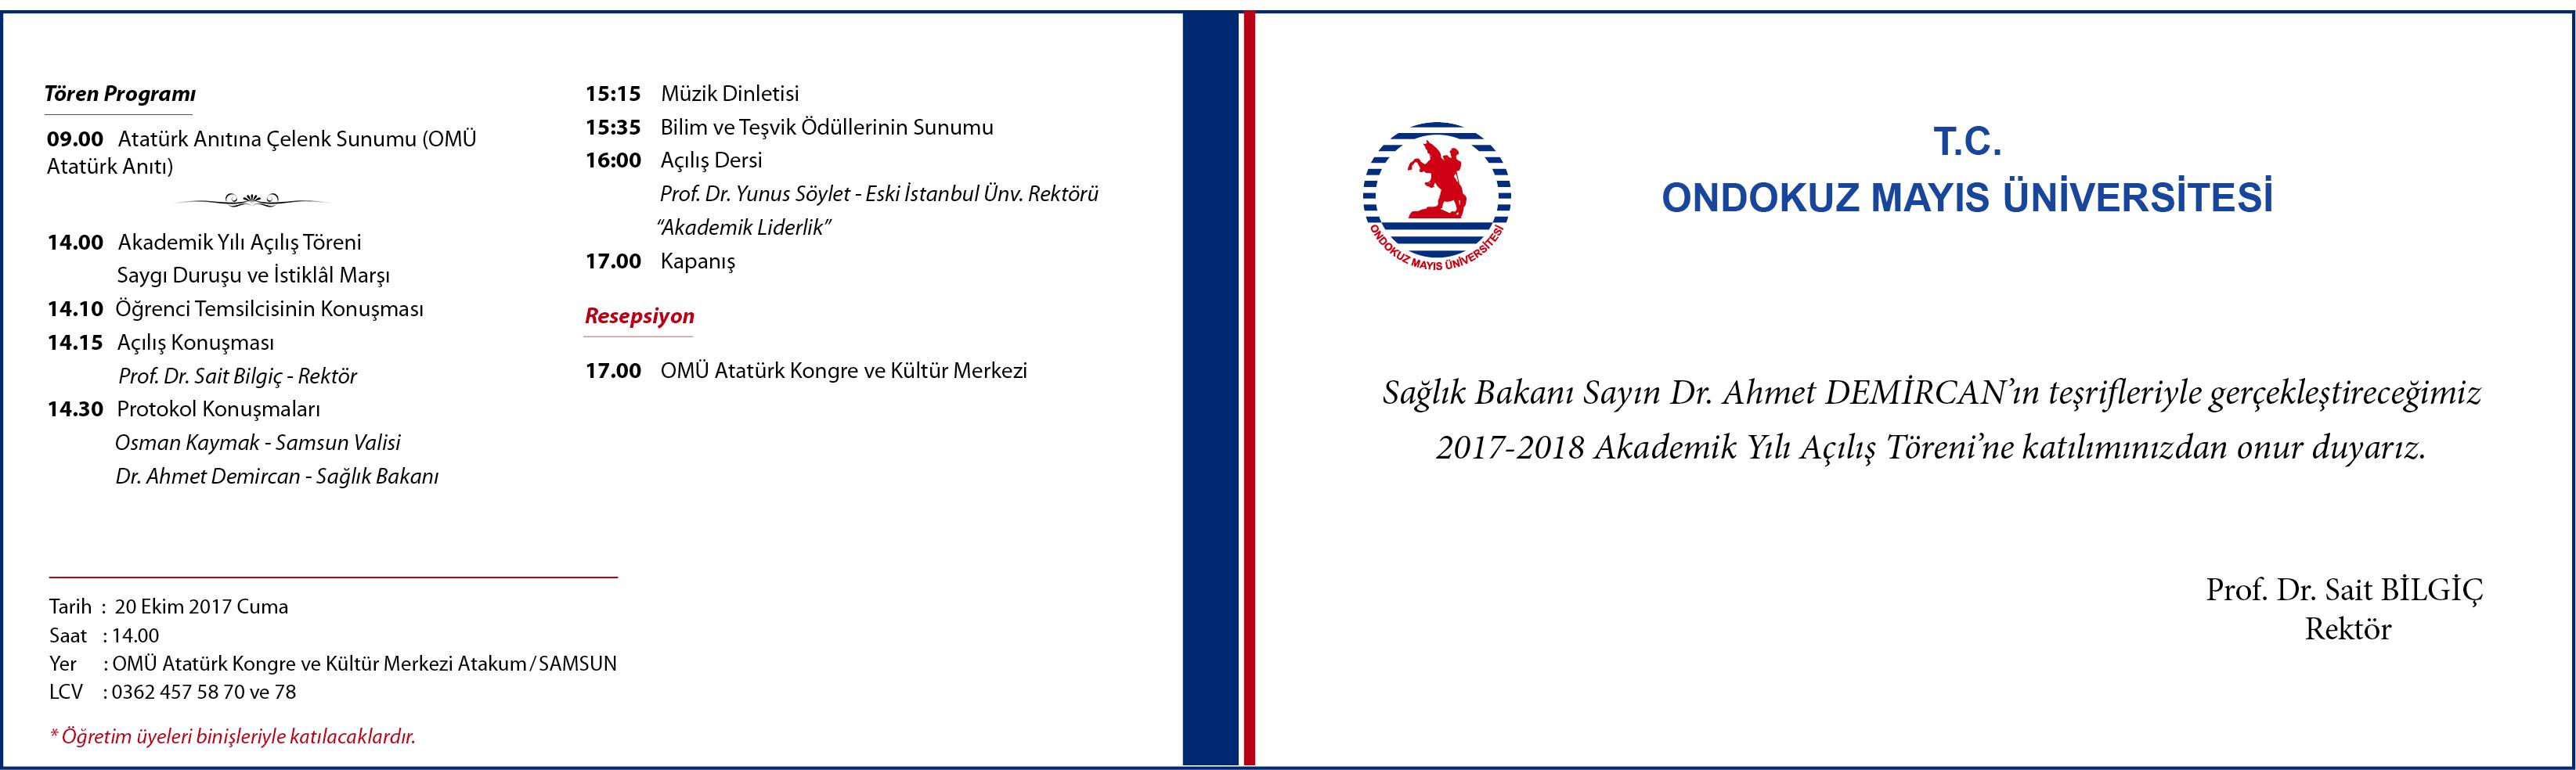 http://www.omu.edu.tr/sites/default/files/files/davet-2017-2018_akademik_yili_acilis_toreni/akademikacilis_email2017.jpg